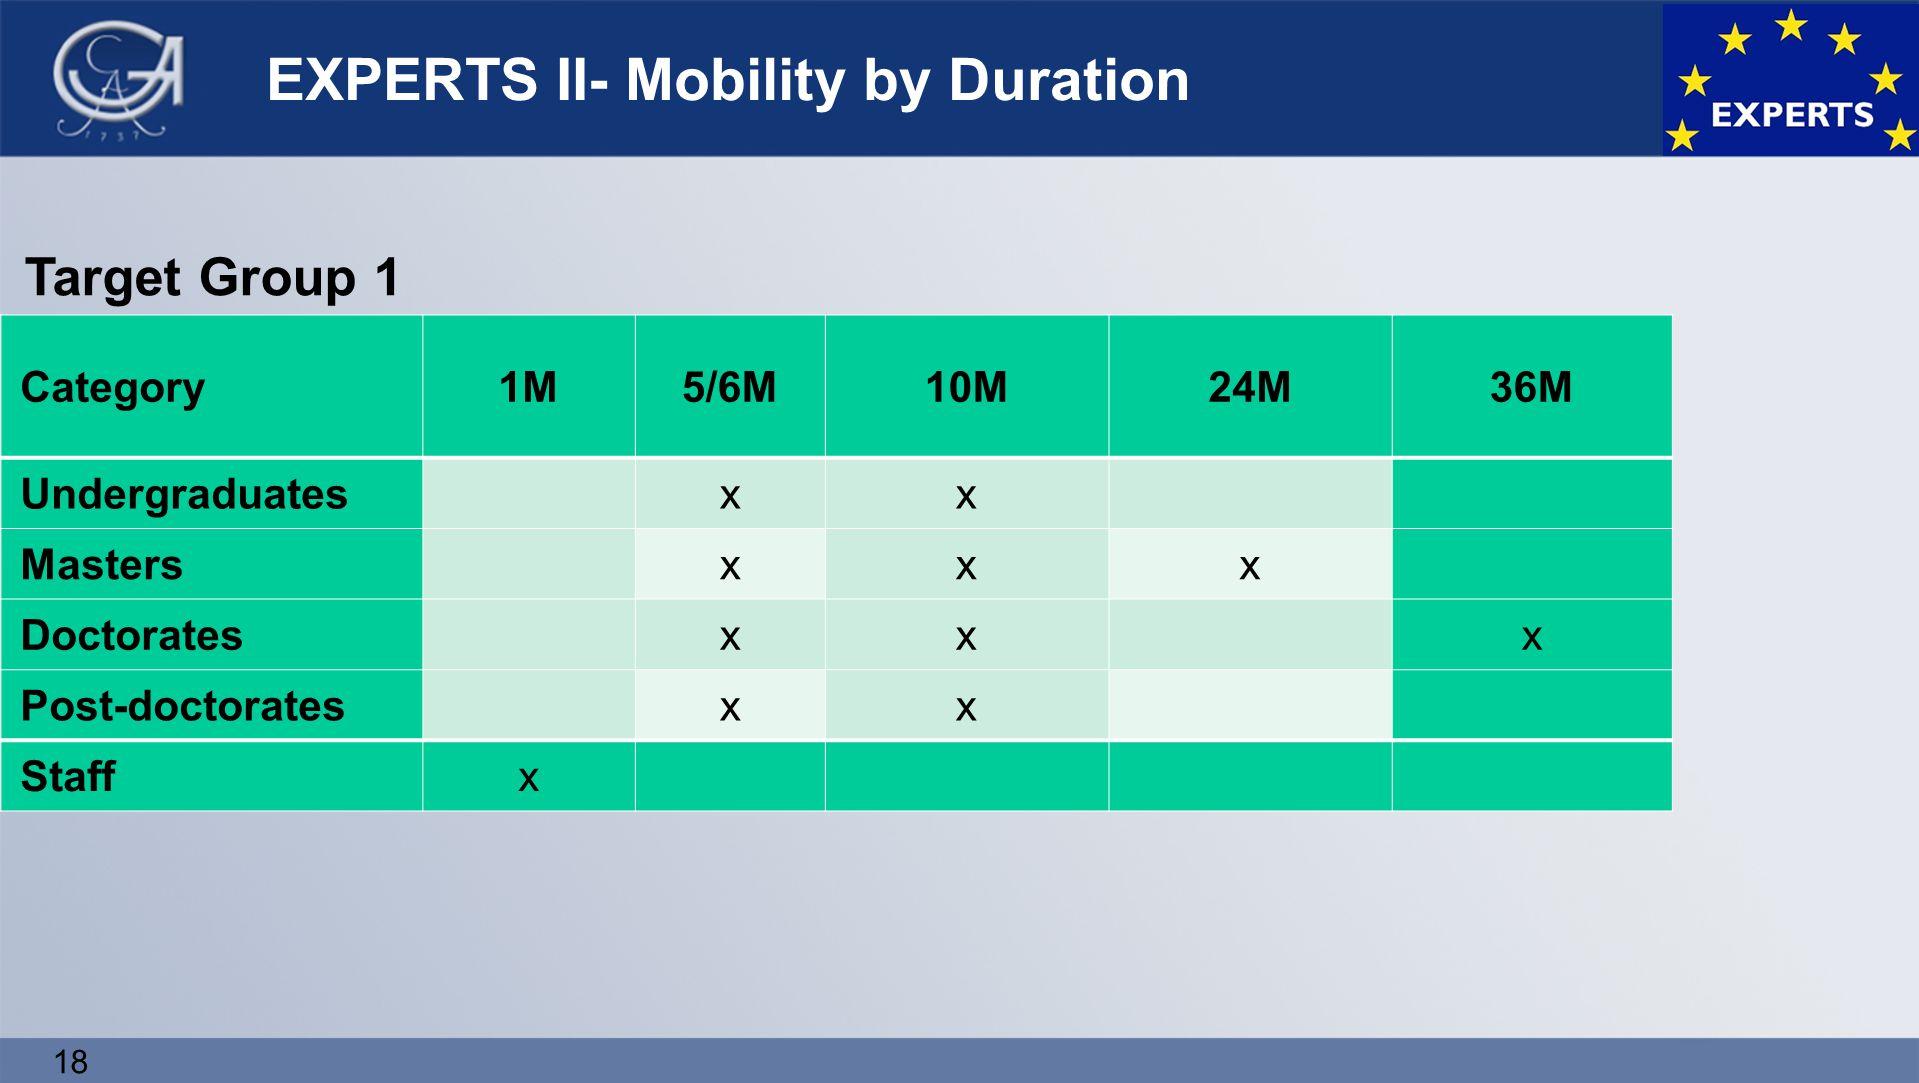 18 EXPERTS II- Mobility by Duration Category1M5/6M10M24M36M Undergraduatesxx Mastersxxx Doctoratesxxx Post-doctoratesxx Staffx Target Group 1